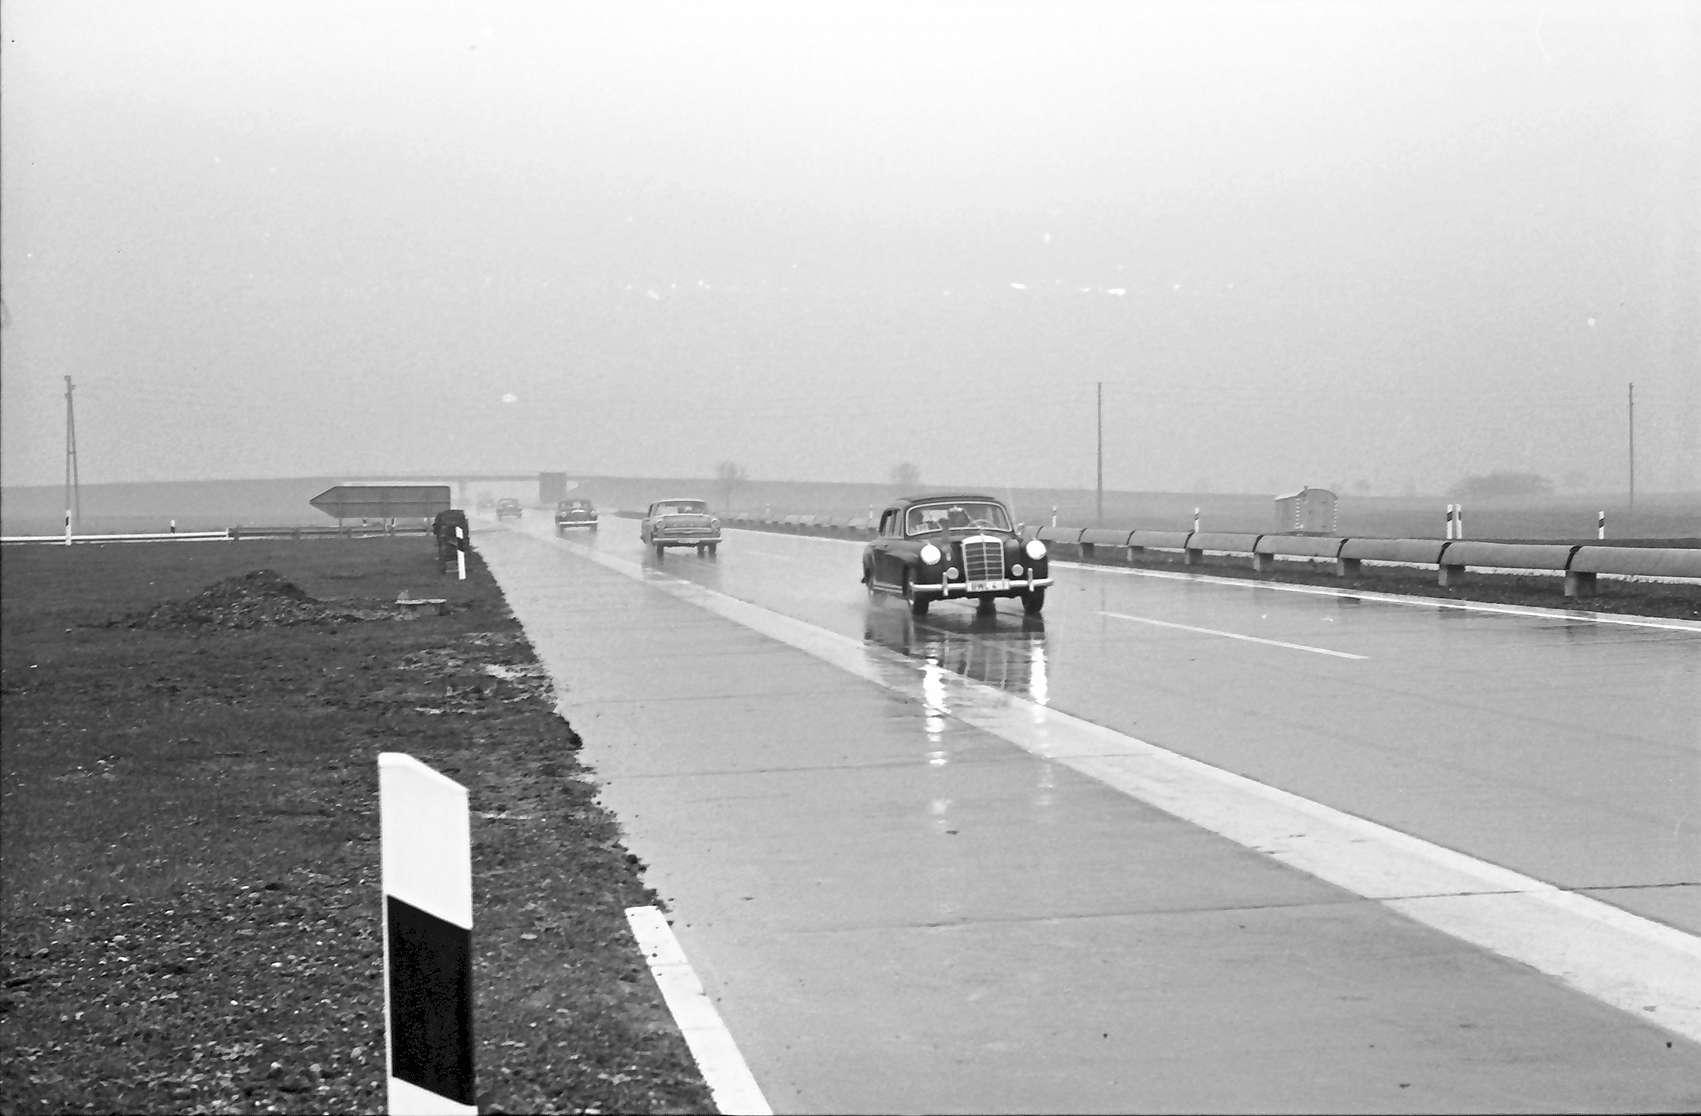 Ettenheim: 1. Wagen der Kolonne; BWL, Bild 1